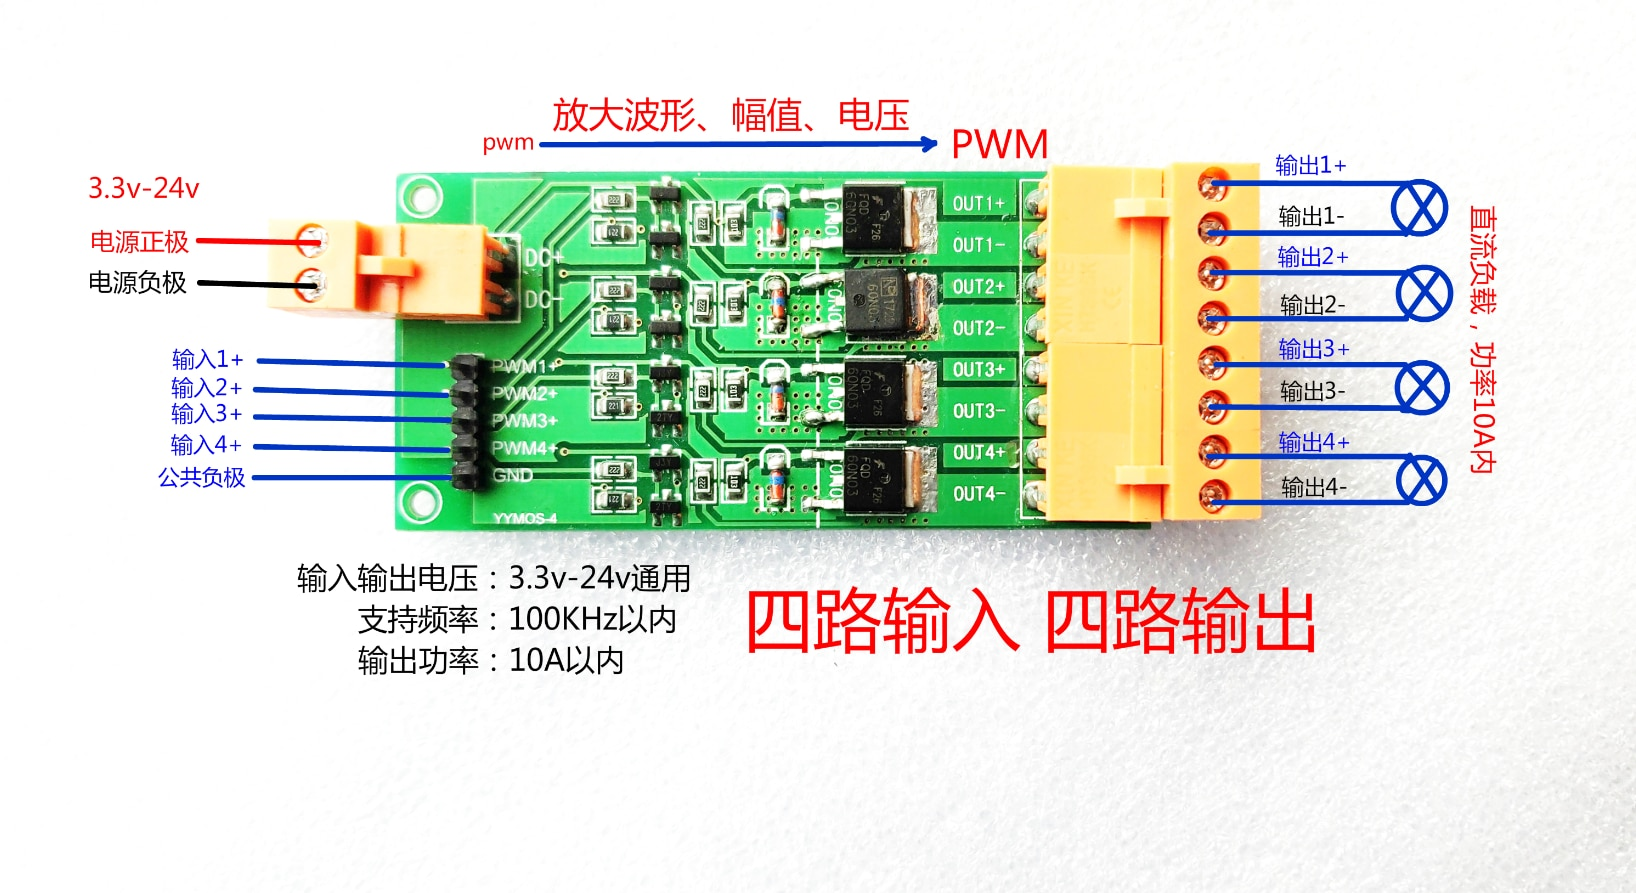 Módulo de controlador de amplificador de potencia regulada de cuatro vías Mos Tube FET PWM 3,3/5/12/24 V